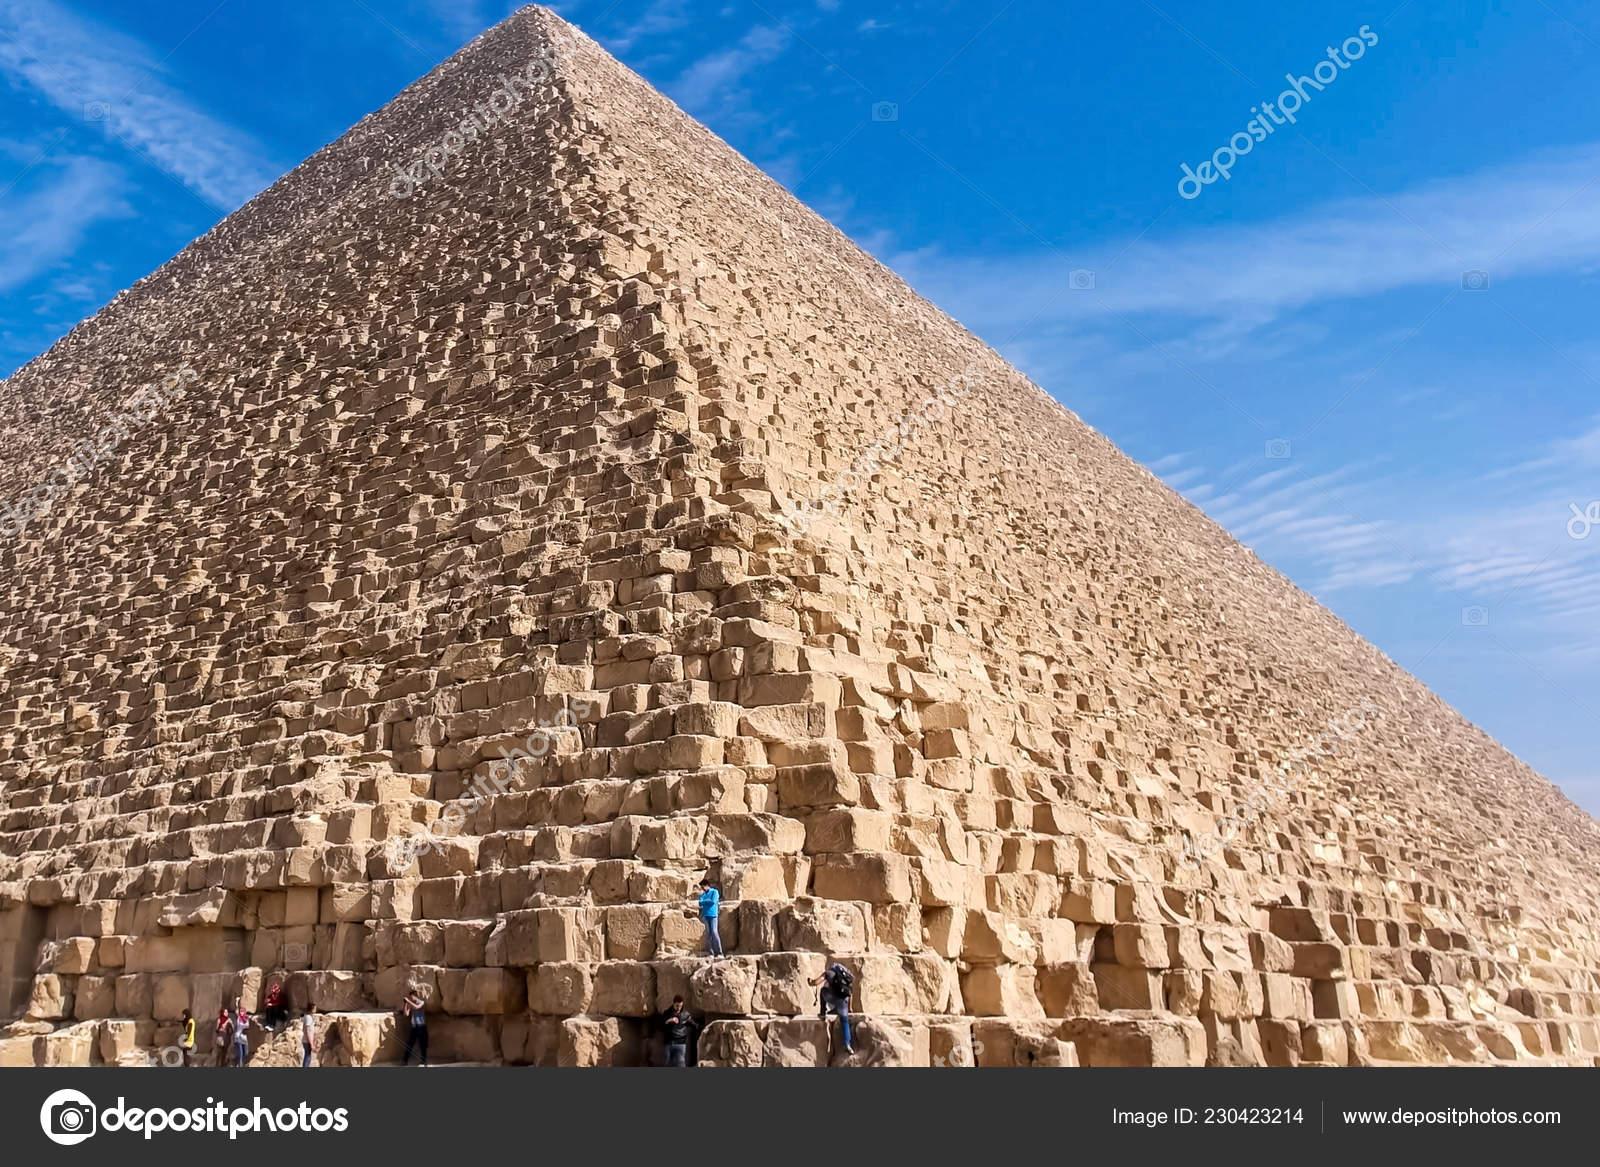 Pyramids Giza Great Pyramids Egypt Seventh Wonder World